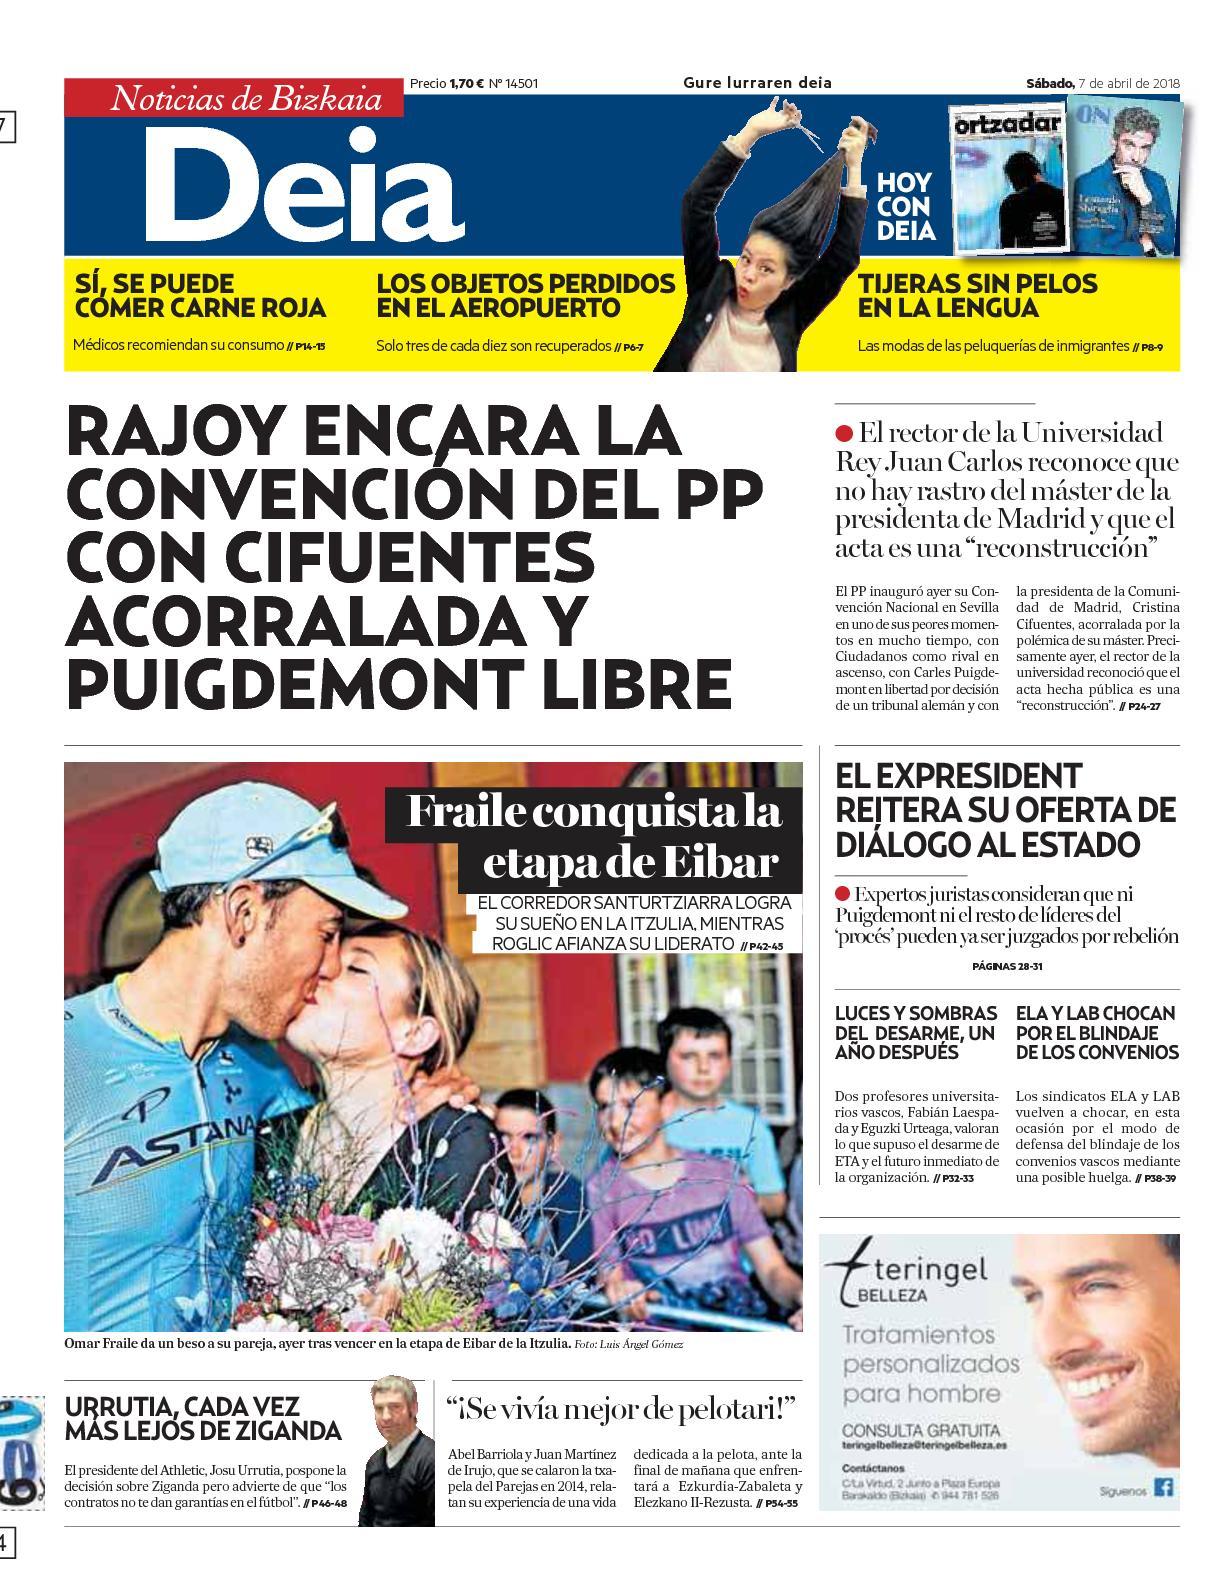 Nichole Galicia dating con